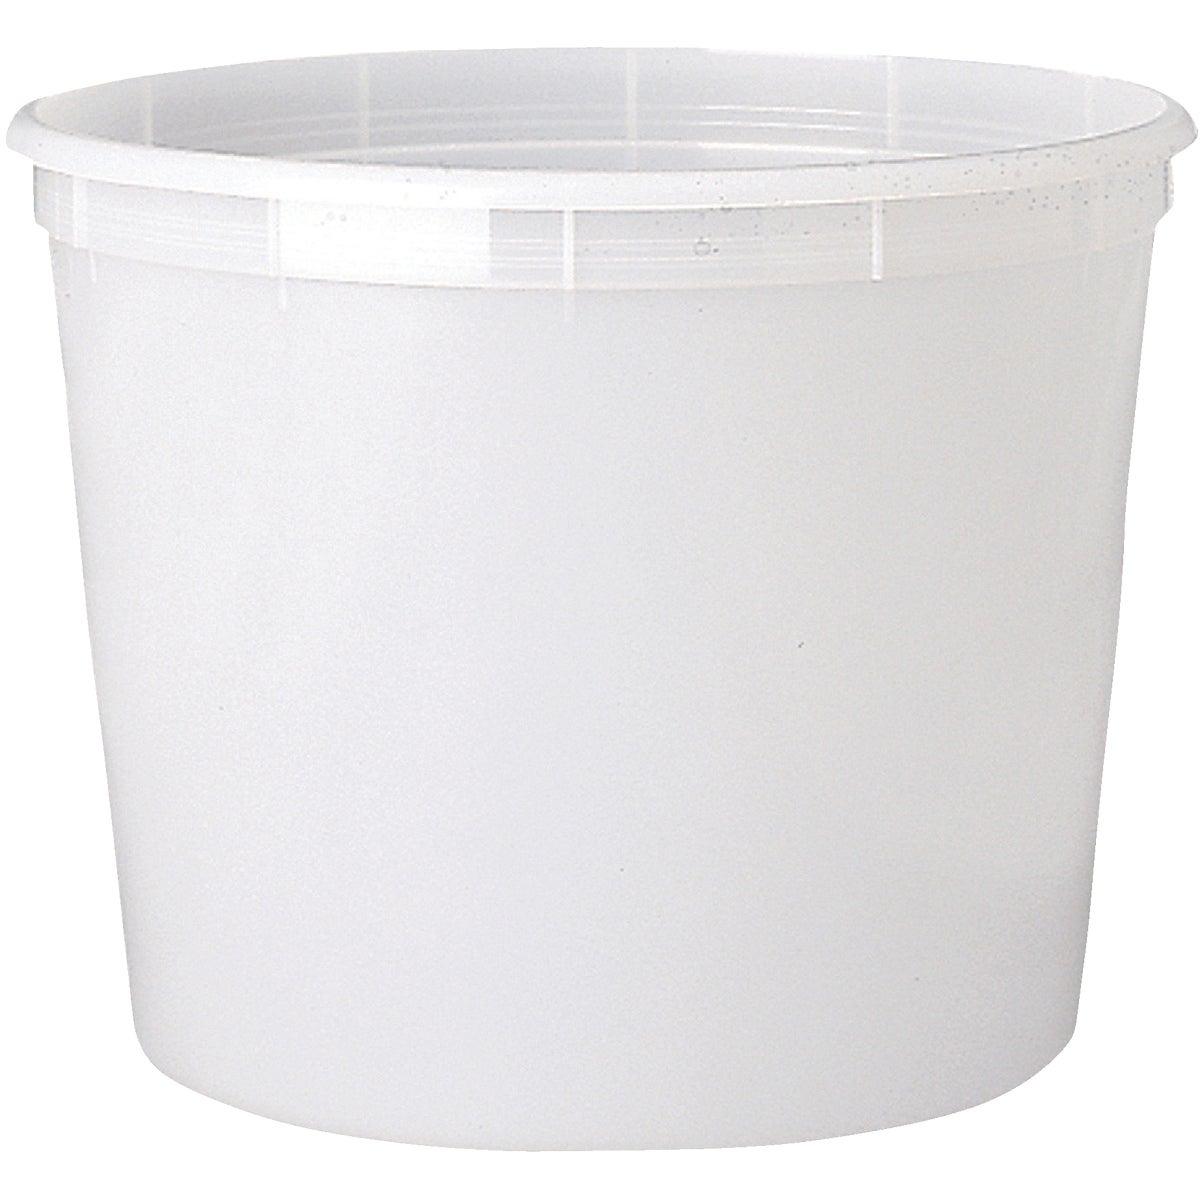 10PT PLASTIC UTILITY TUB